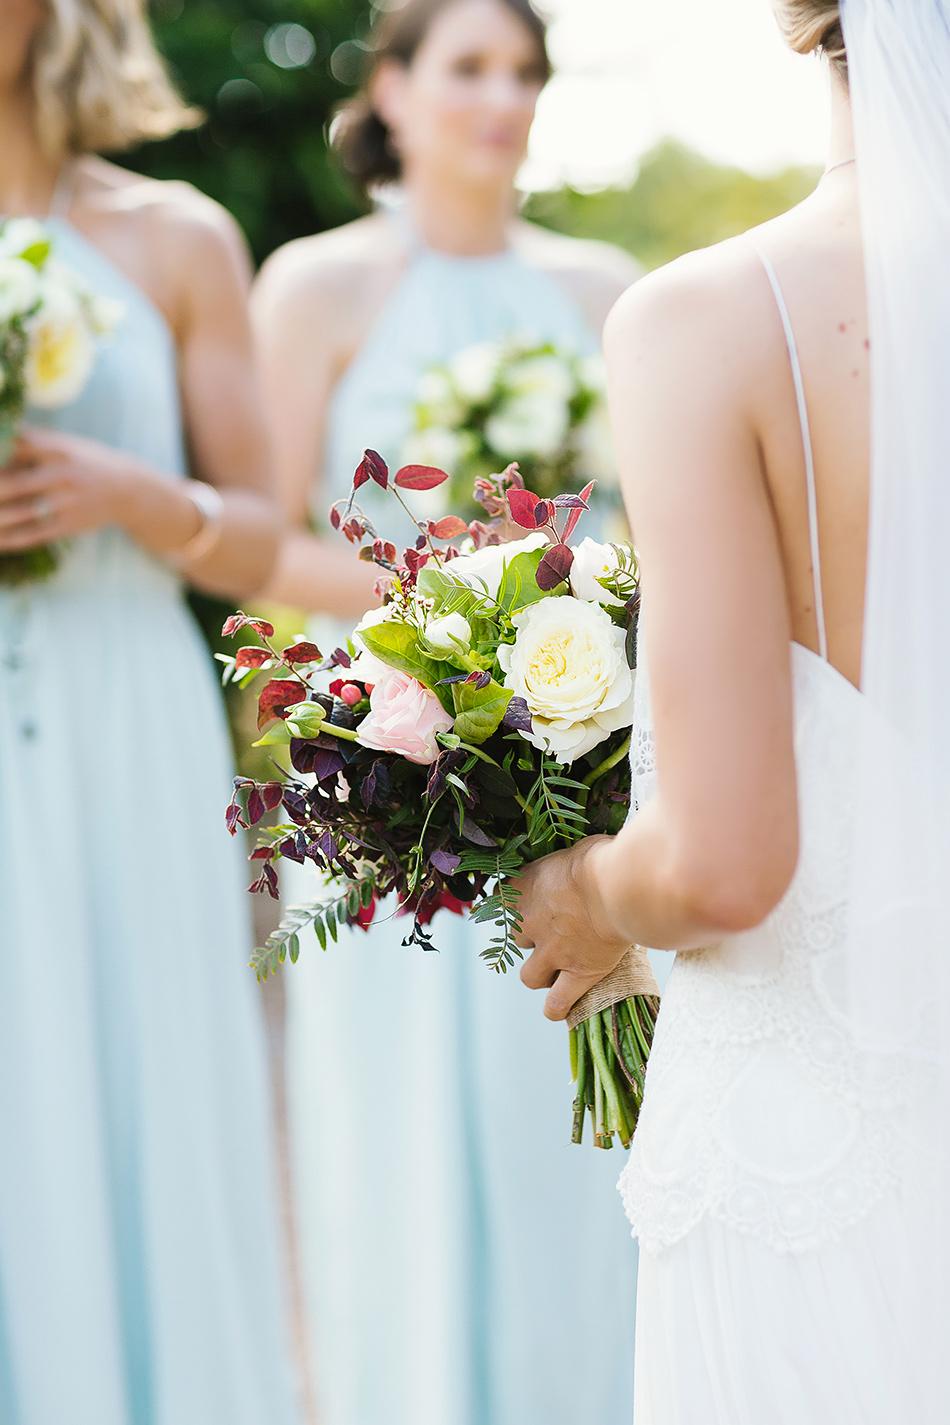 wedding flowers bangalow wedding bouquet byron bay natural wedding flowers creative wedding photographer